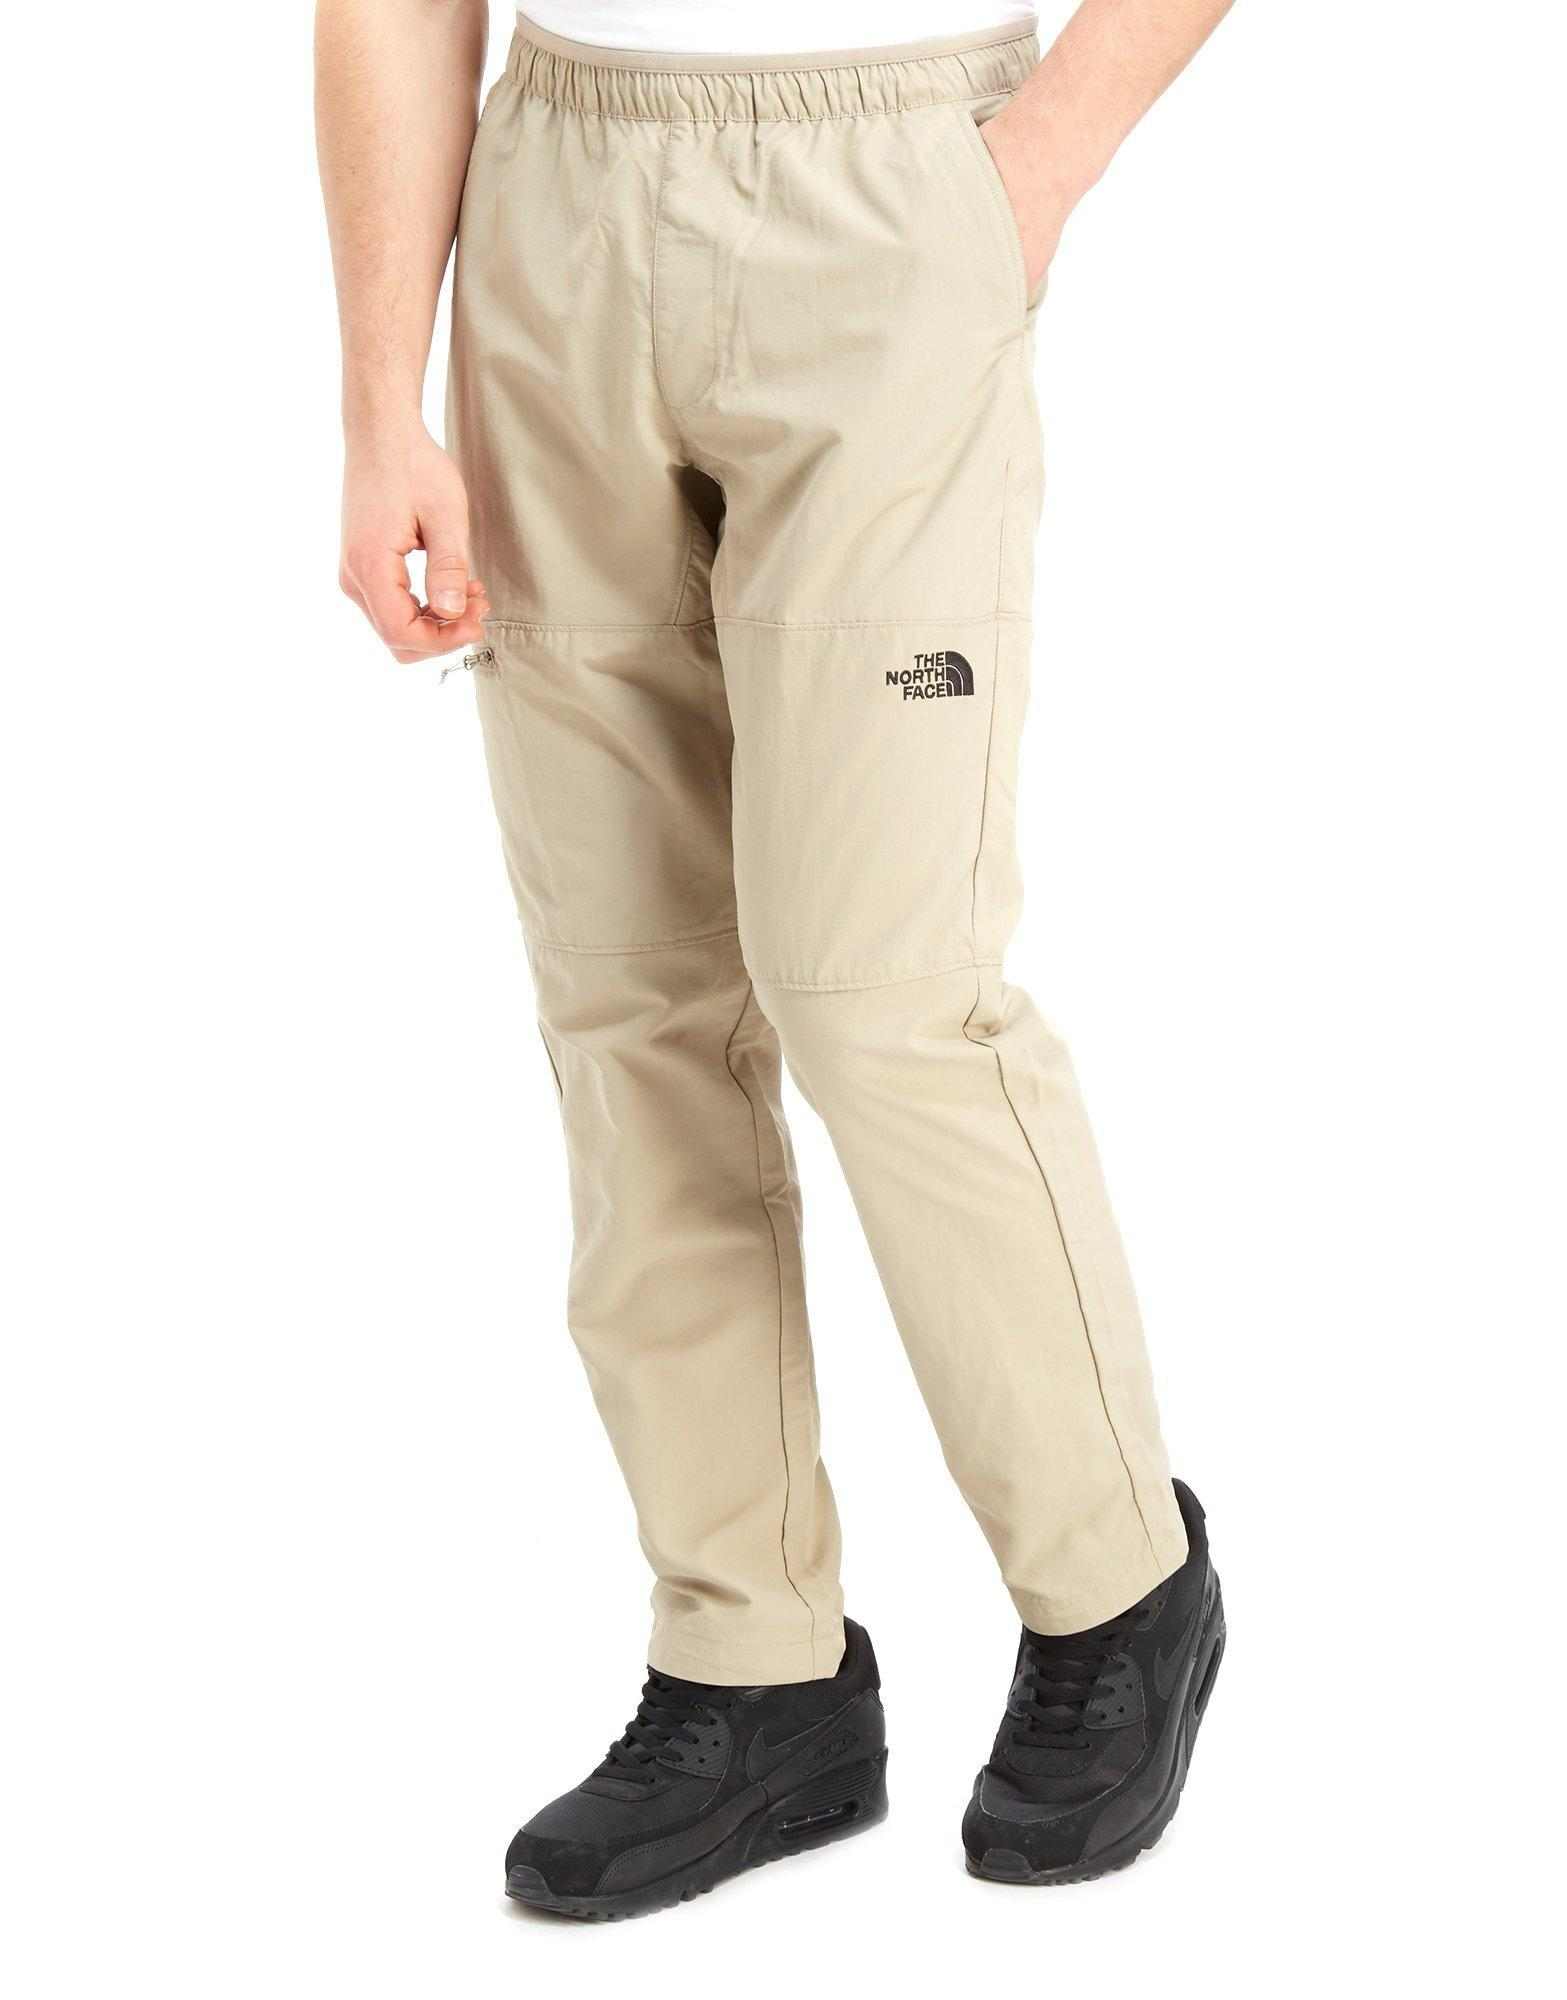 best supplier wholesale online the best attitude The North Face Natural Z-pocket Pants for men